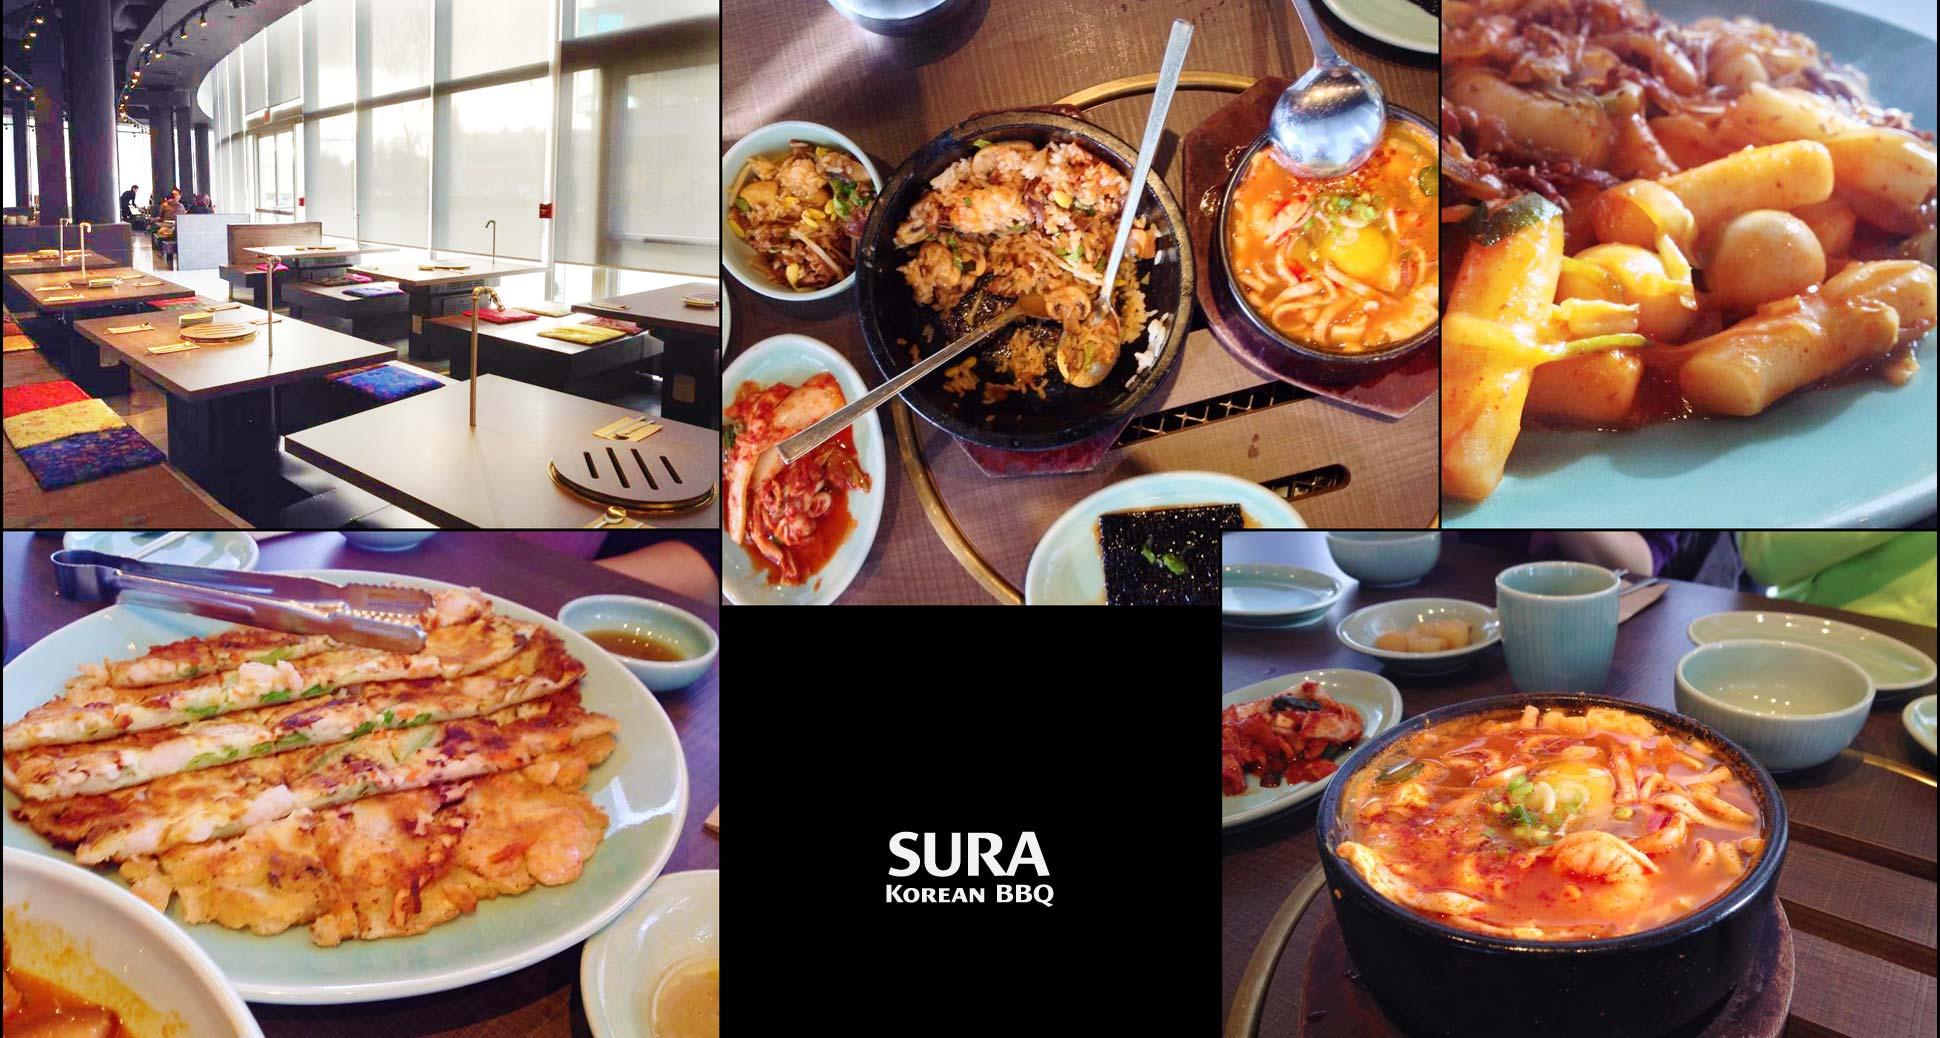 Nomss covers sura korean bbq restaurant